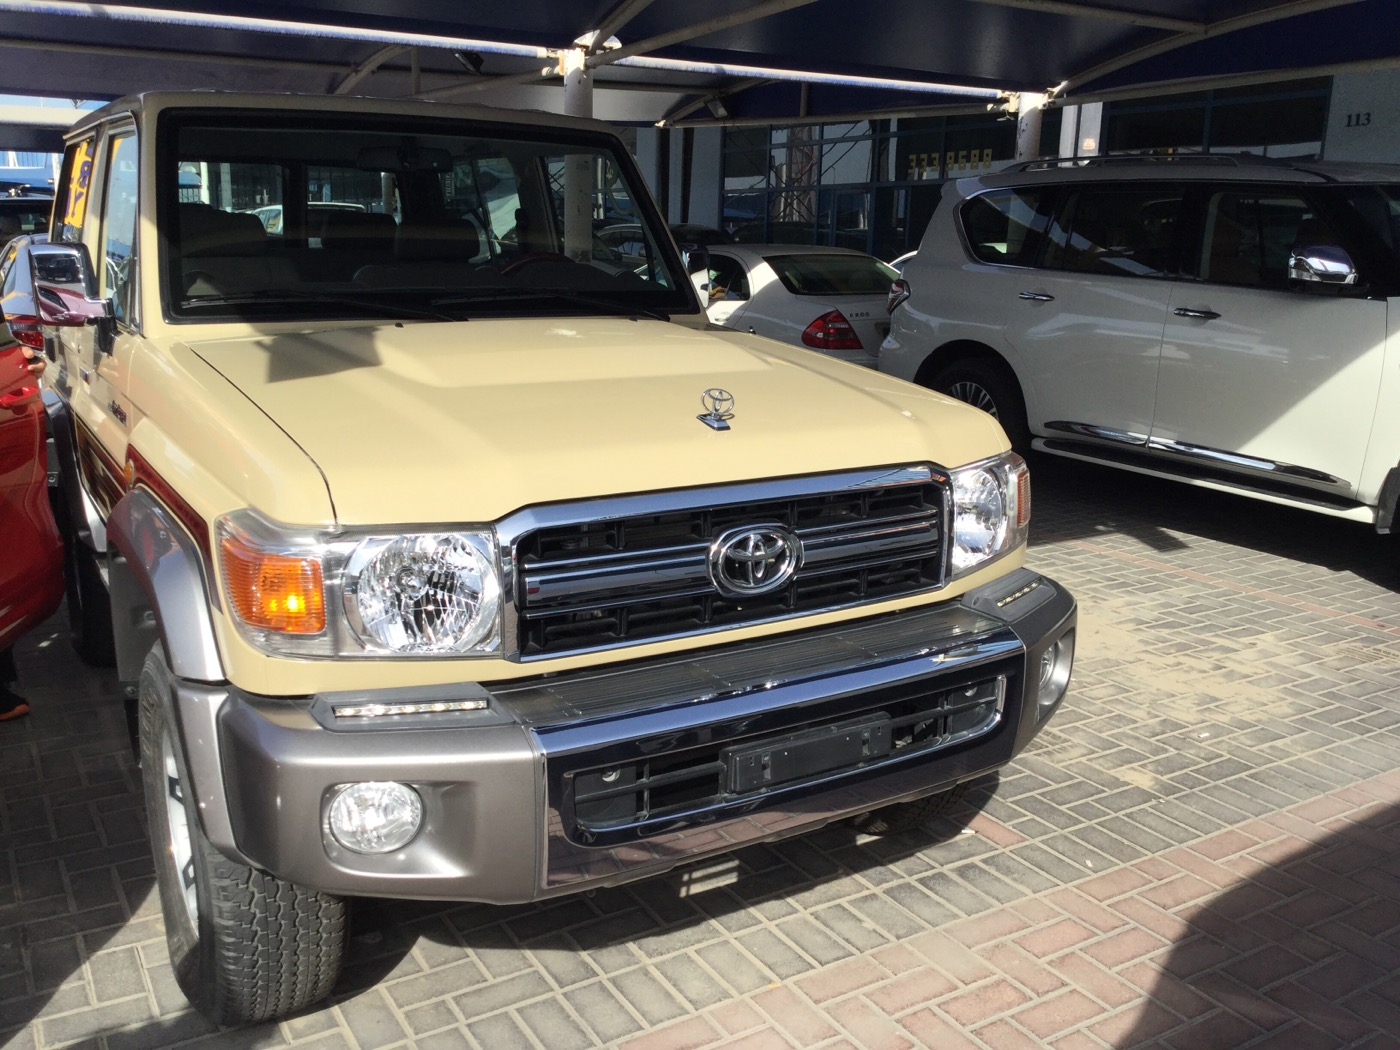 2014 Toyota Land Cruiser Suv For Sale In Dubai Motoraty